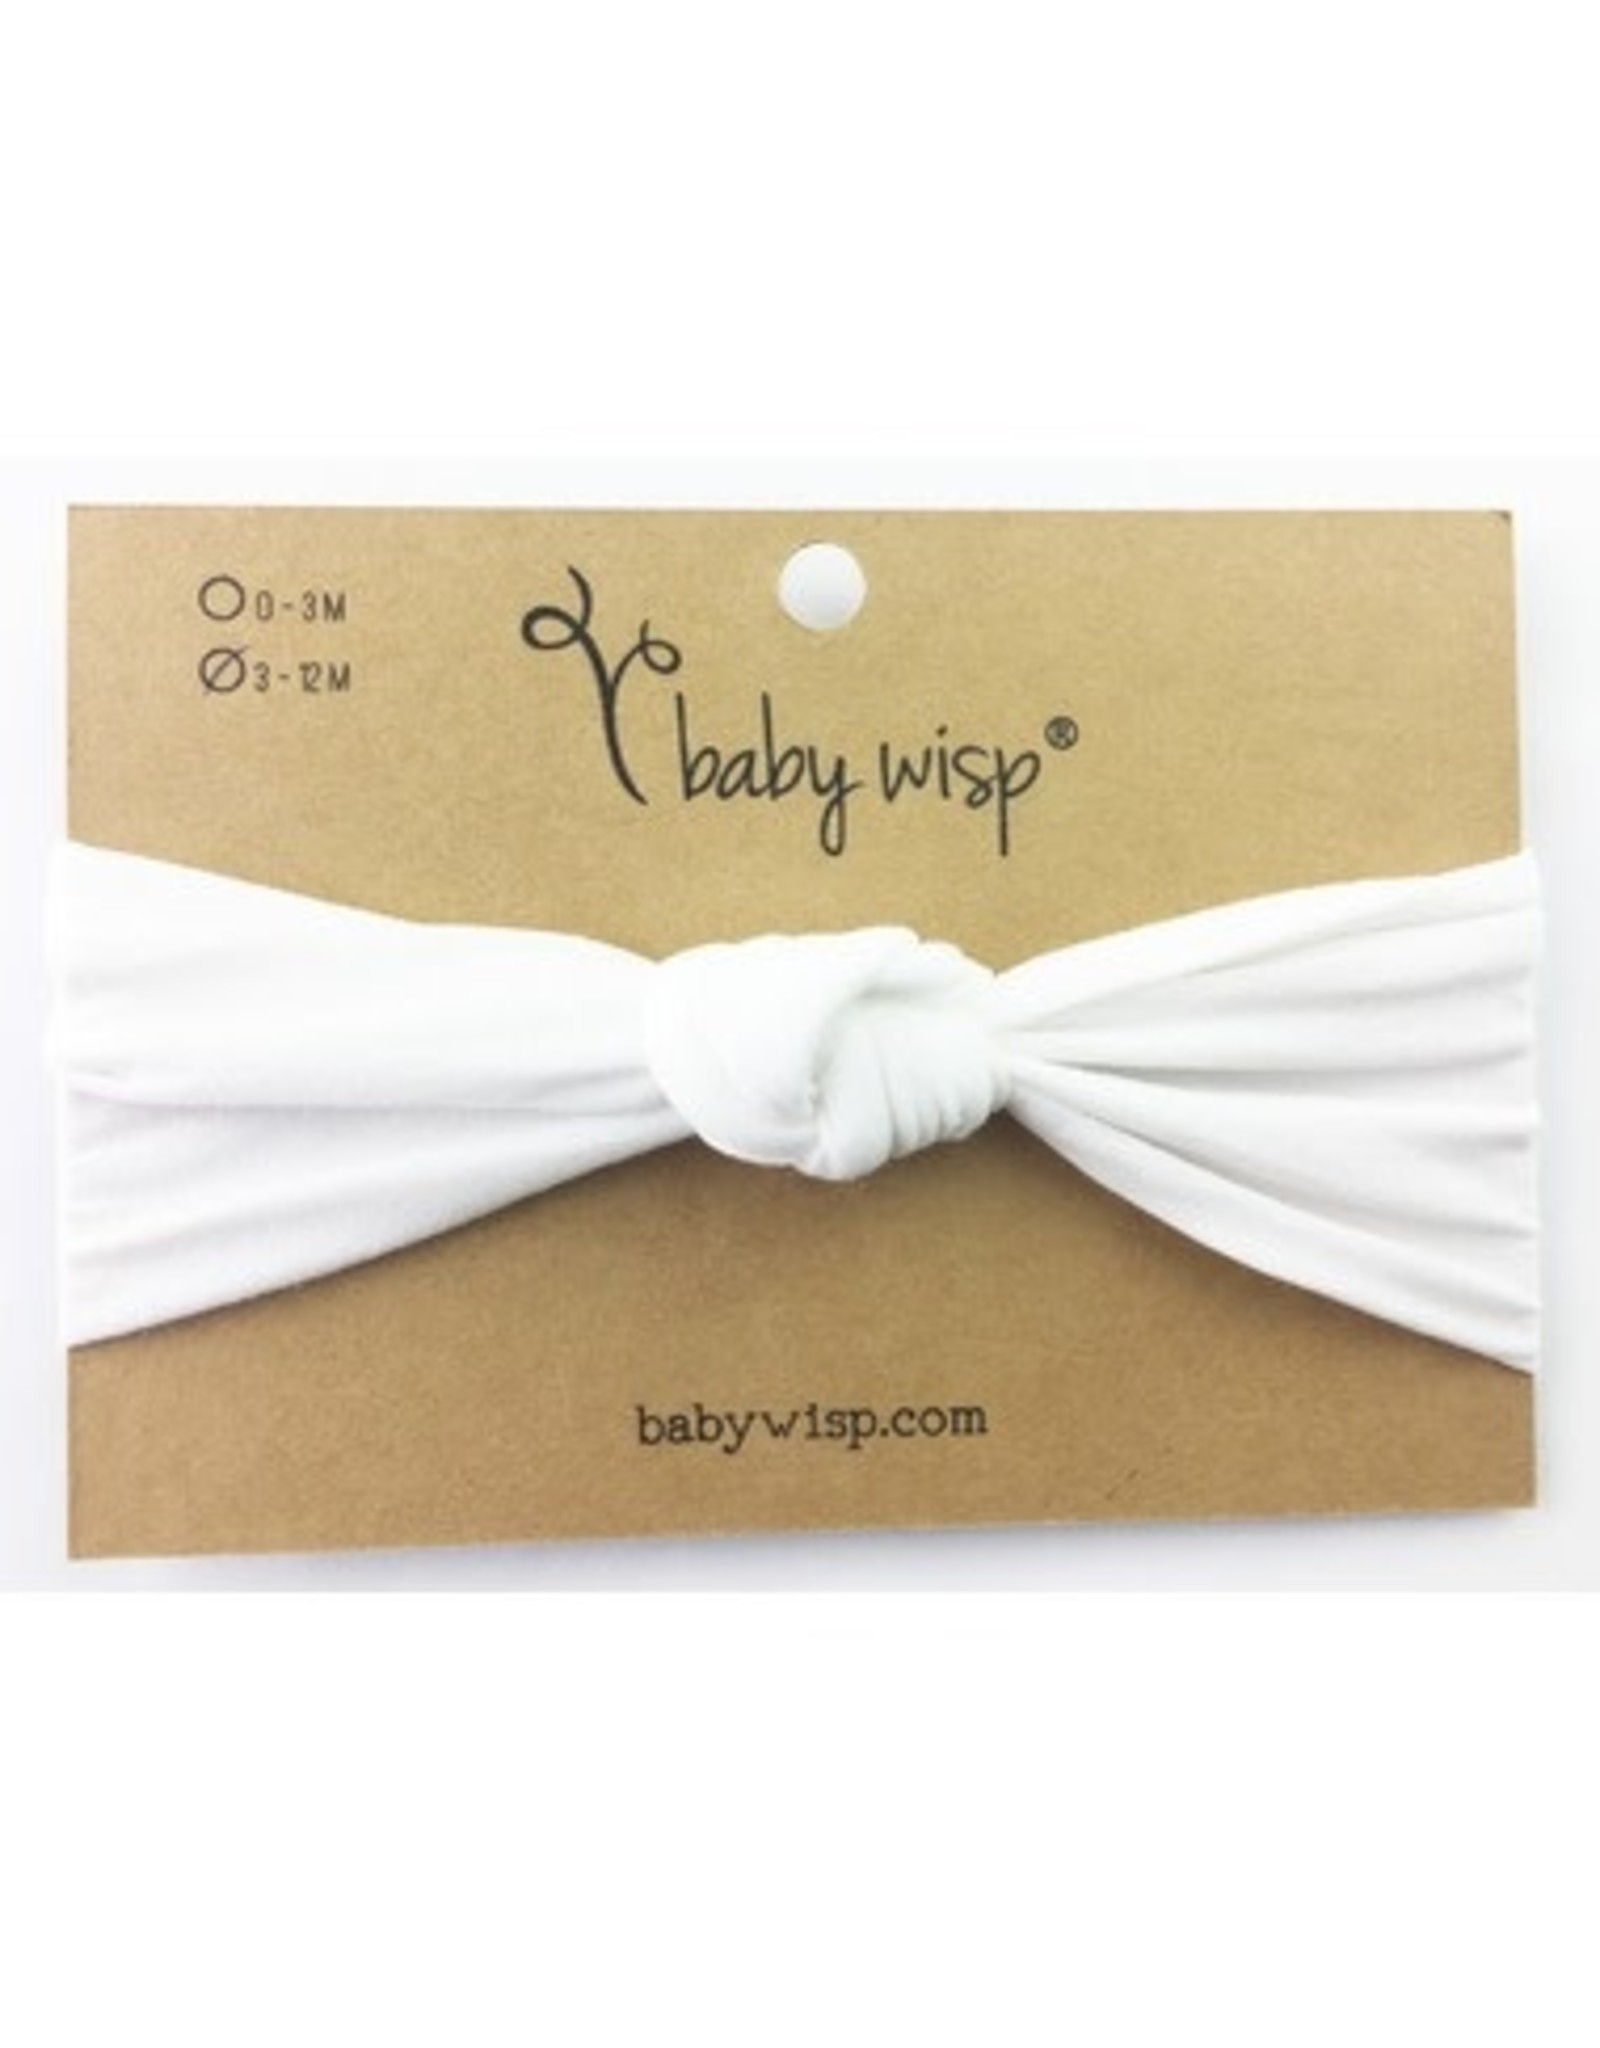 Baby Wisp Baby Wisp Turban Knot Headband, White